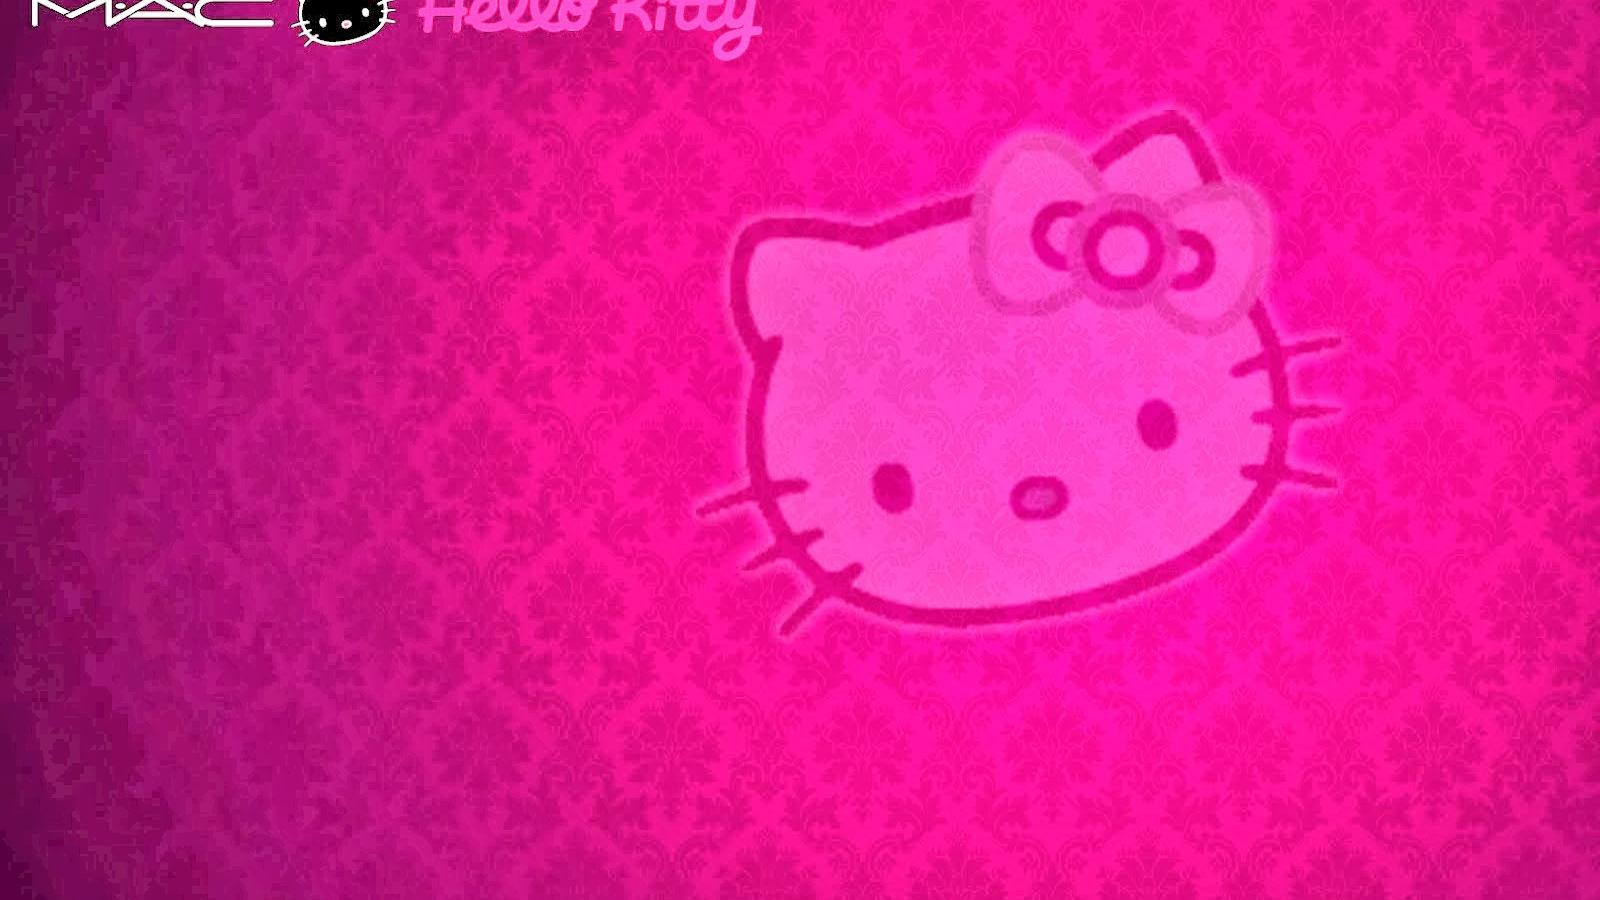 Free WALLPAPER HELLO KITTY IN MAC Gambar Kartun